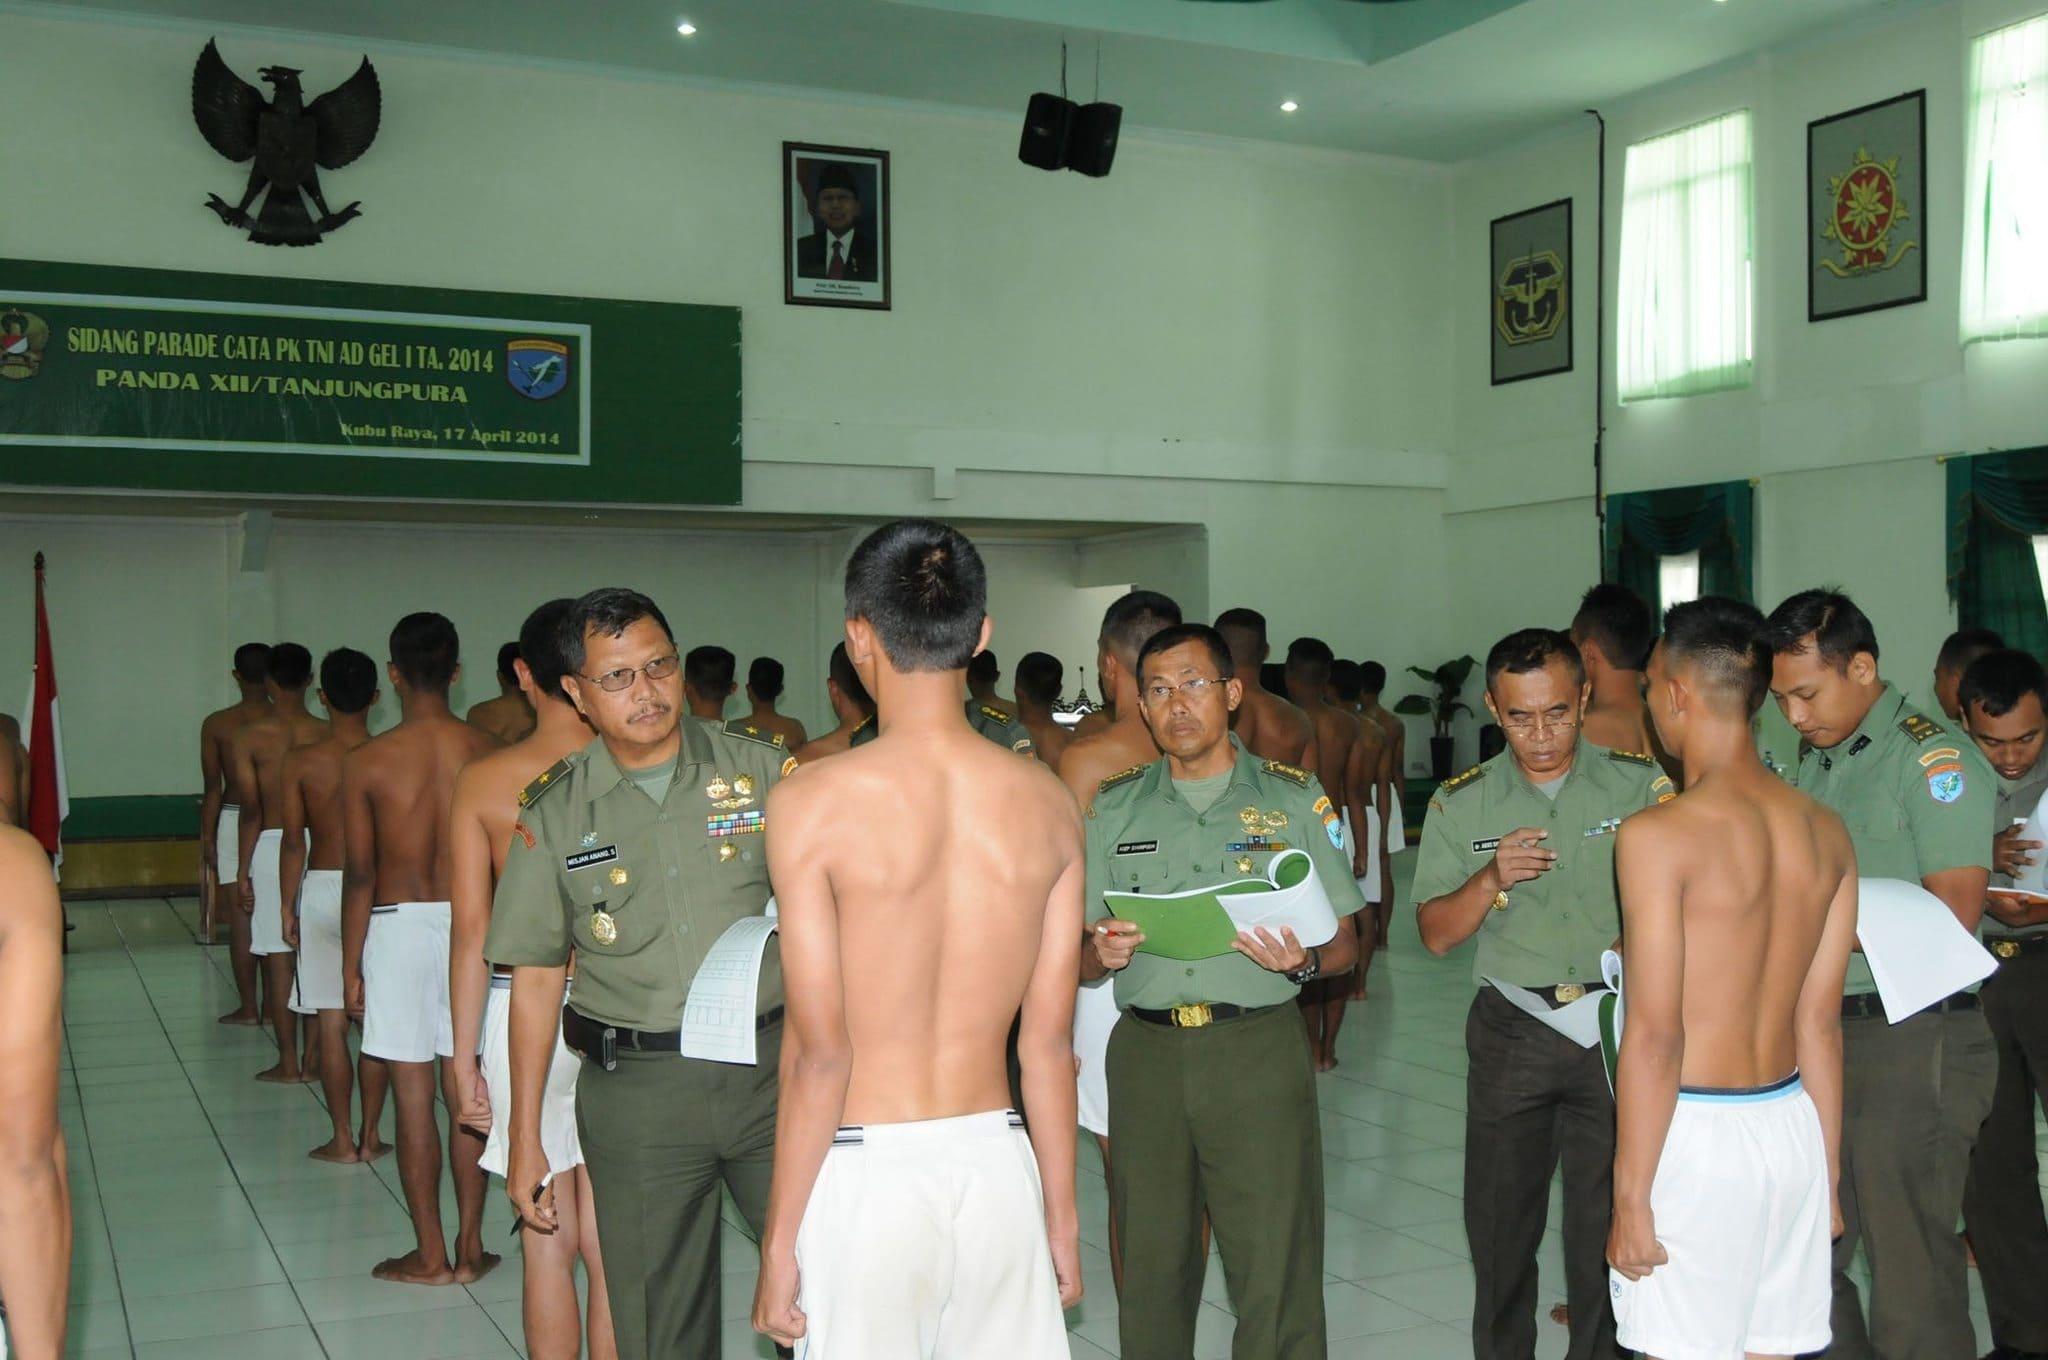 Panda XII/Tpr, gelar Sidang Parade Cata PK TNI AD Gel-I TA. 2014